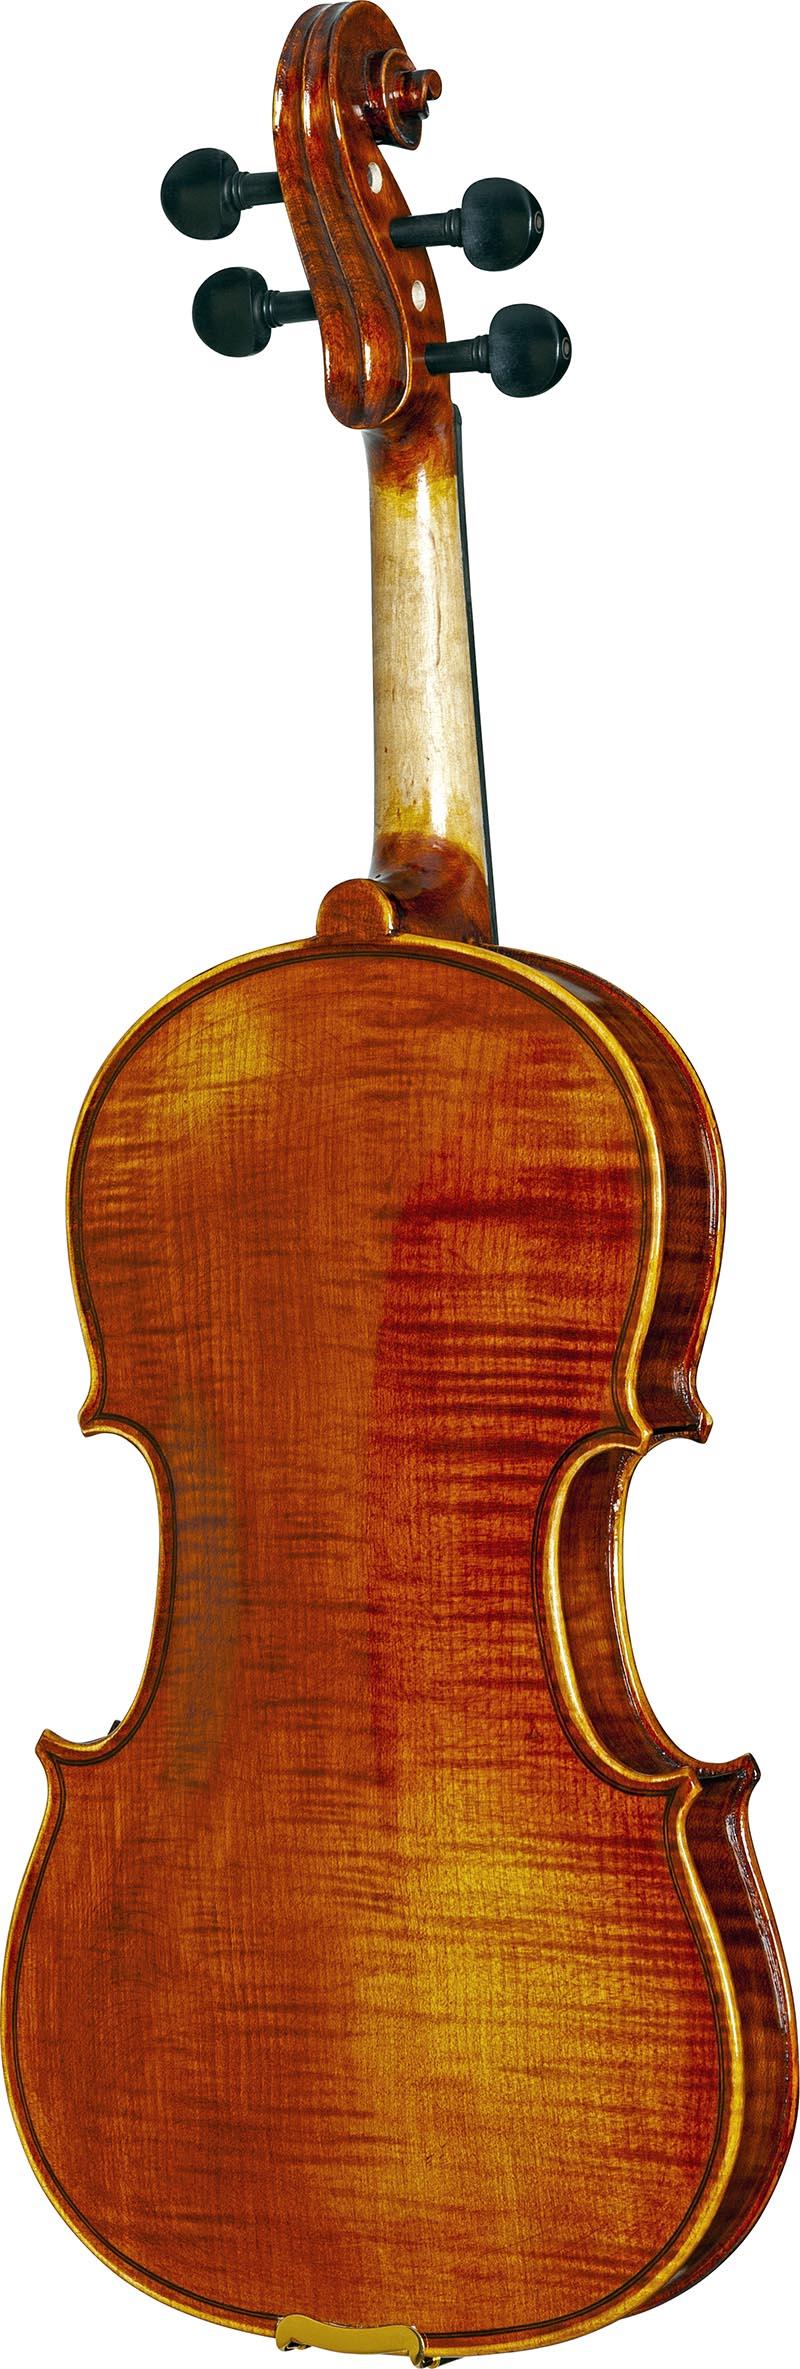 vk544 violino eagle vk544 visao posterior vertical